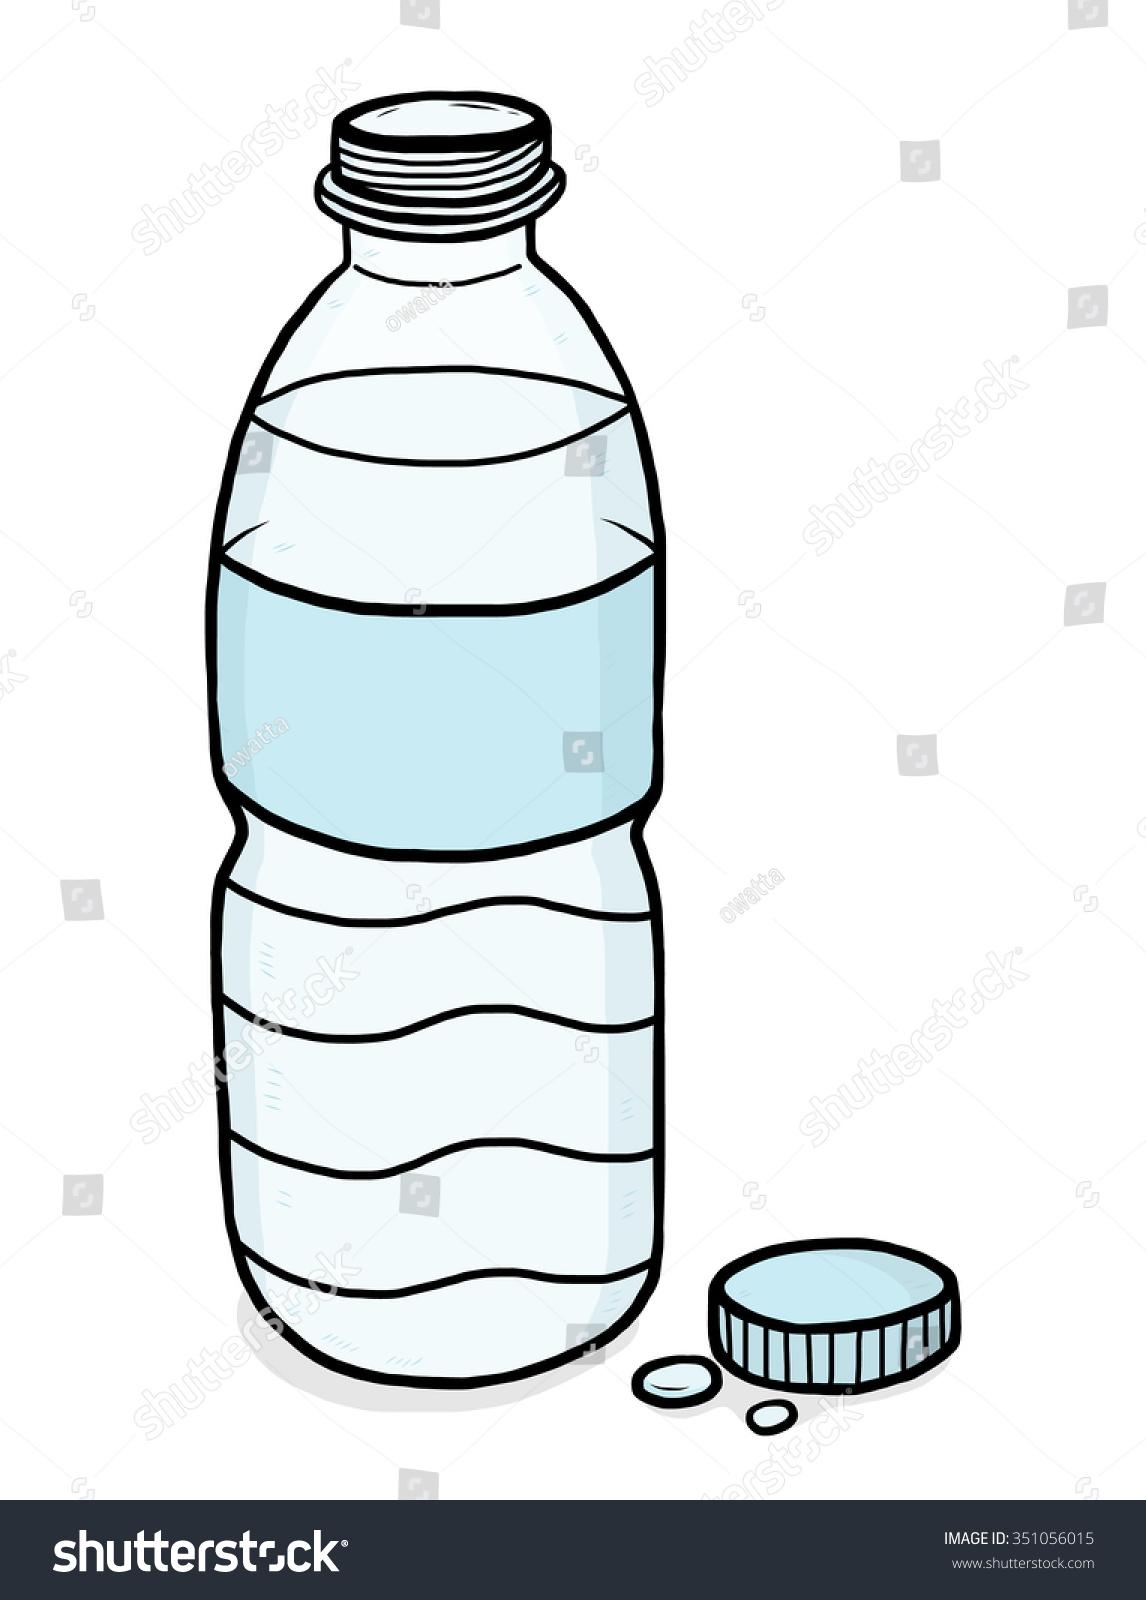 royalty free water plastic bottle cartoon vector 351056015 stock